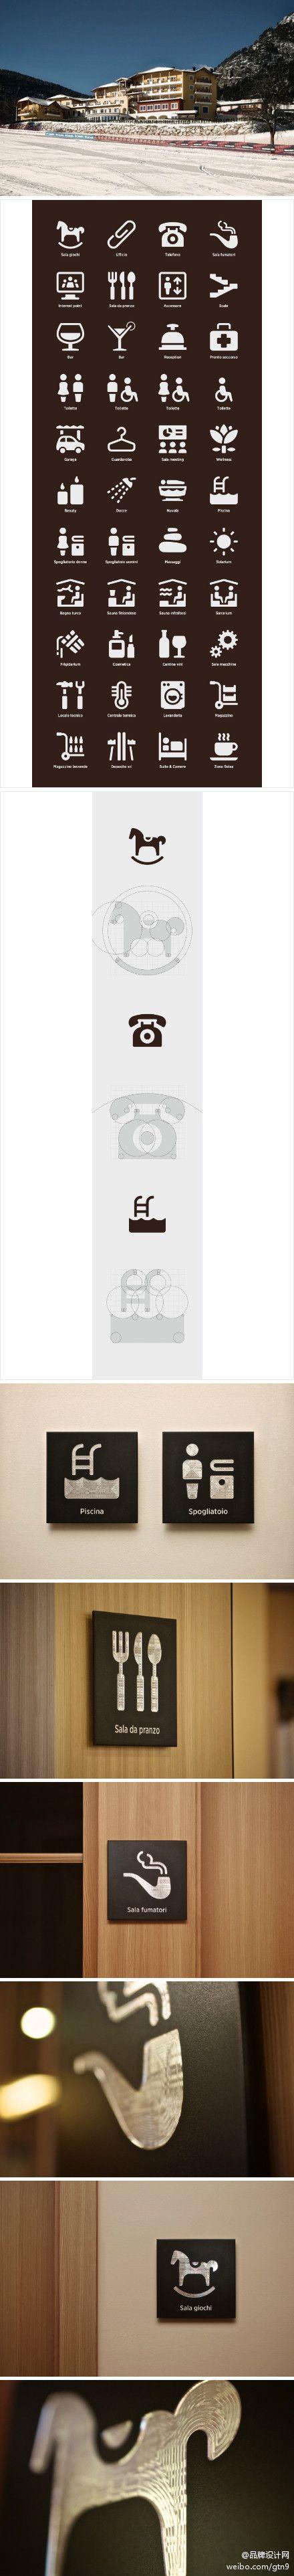 WOW_icons  signage / spc